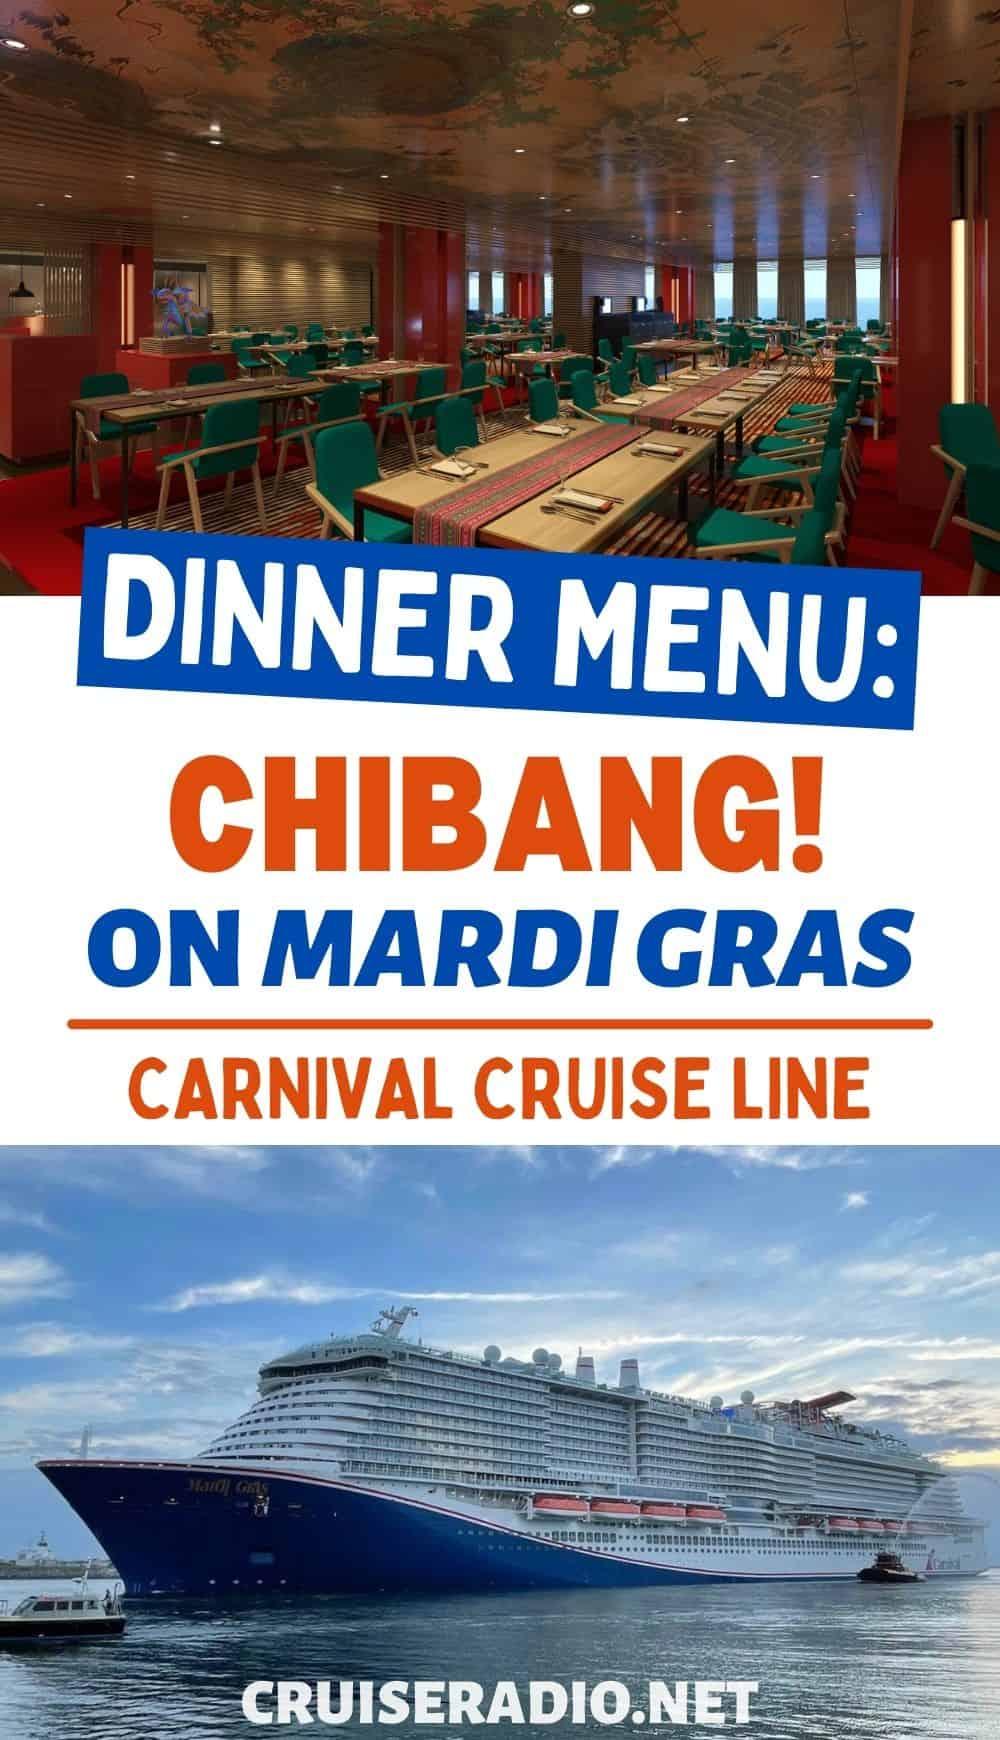 carnival cruise chibang dinner menu